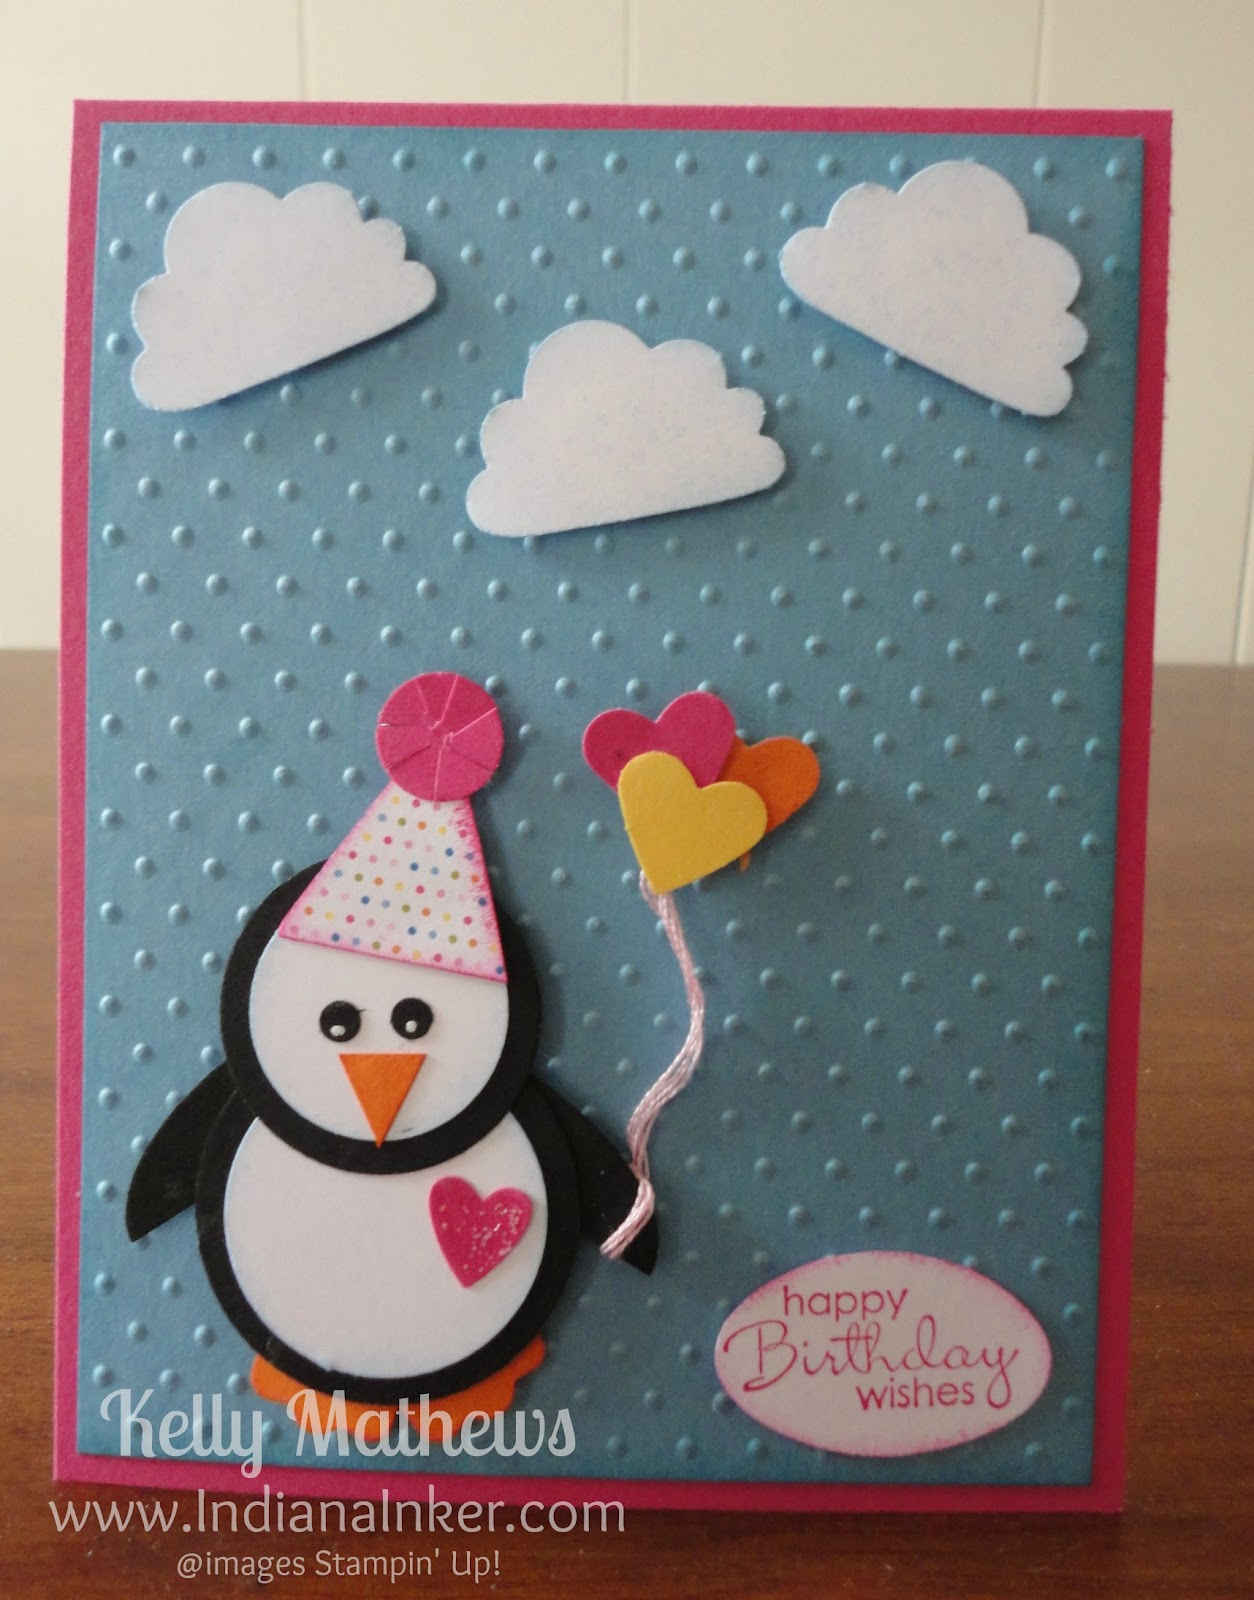 indiana inker penguin birthday card, Birthday card